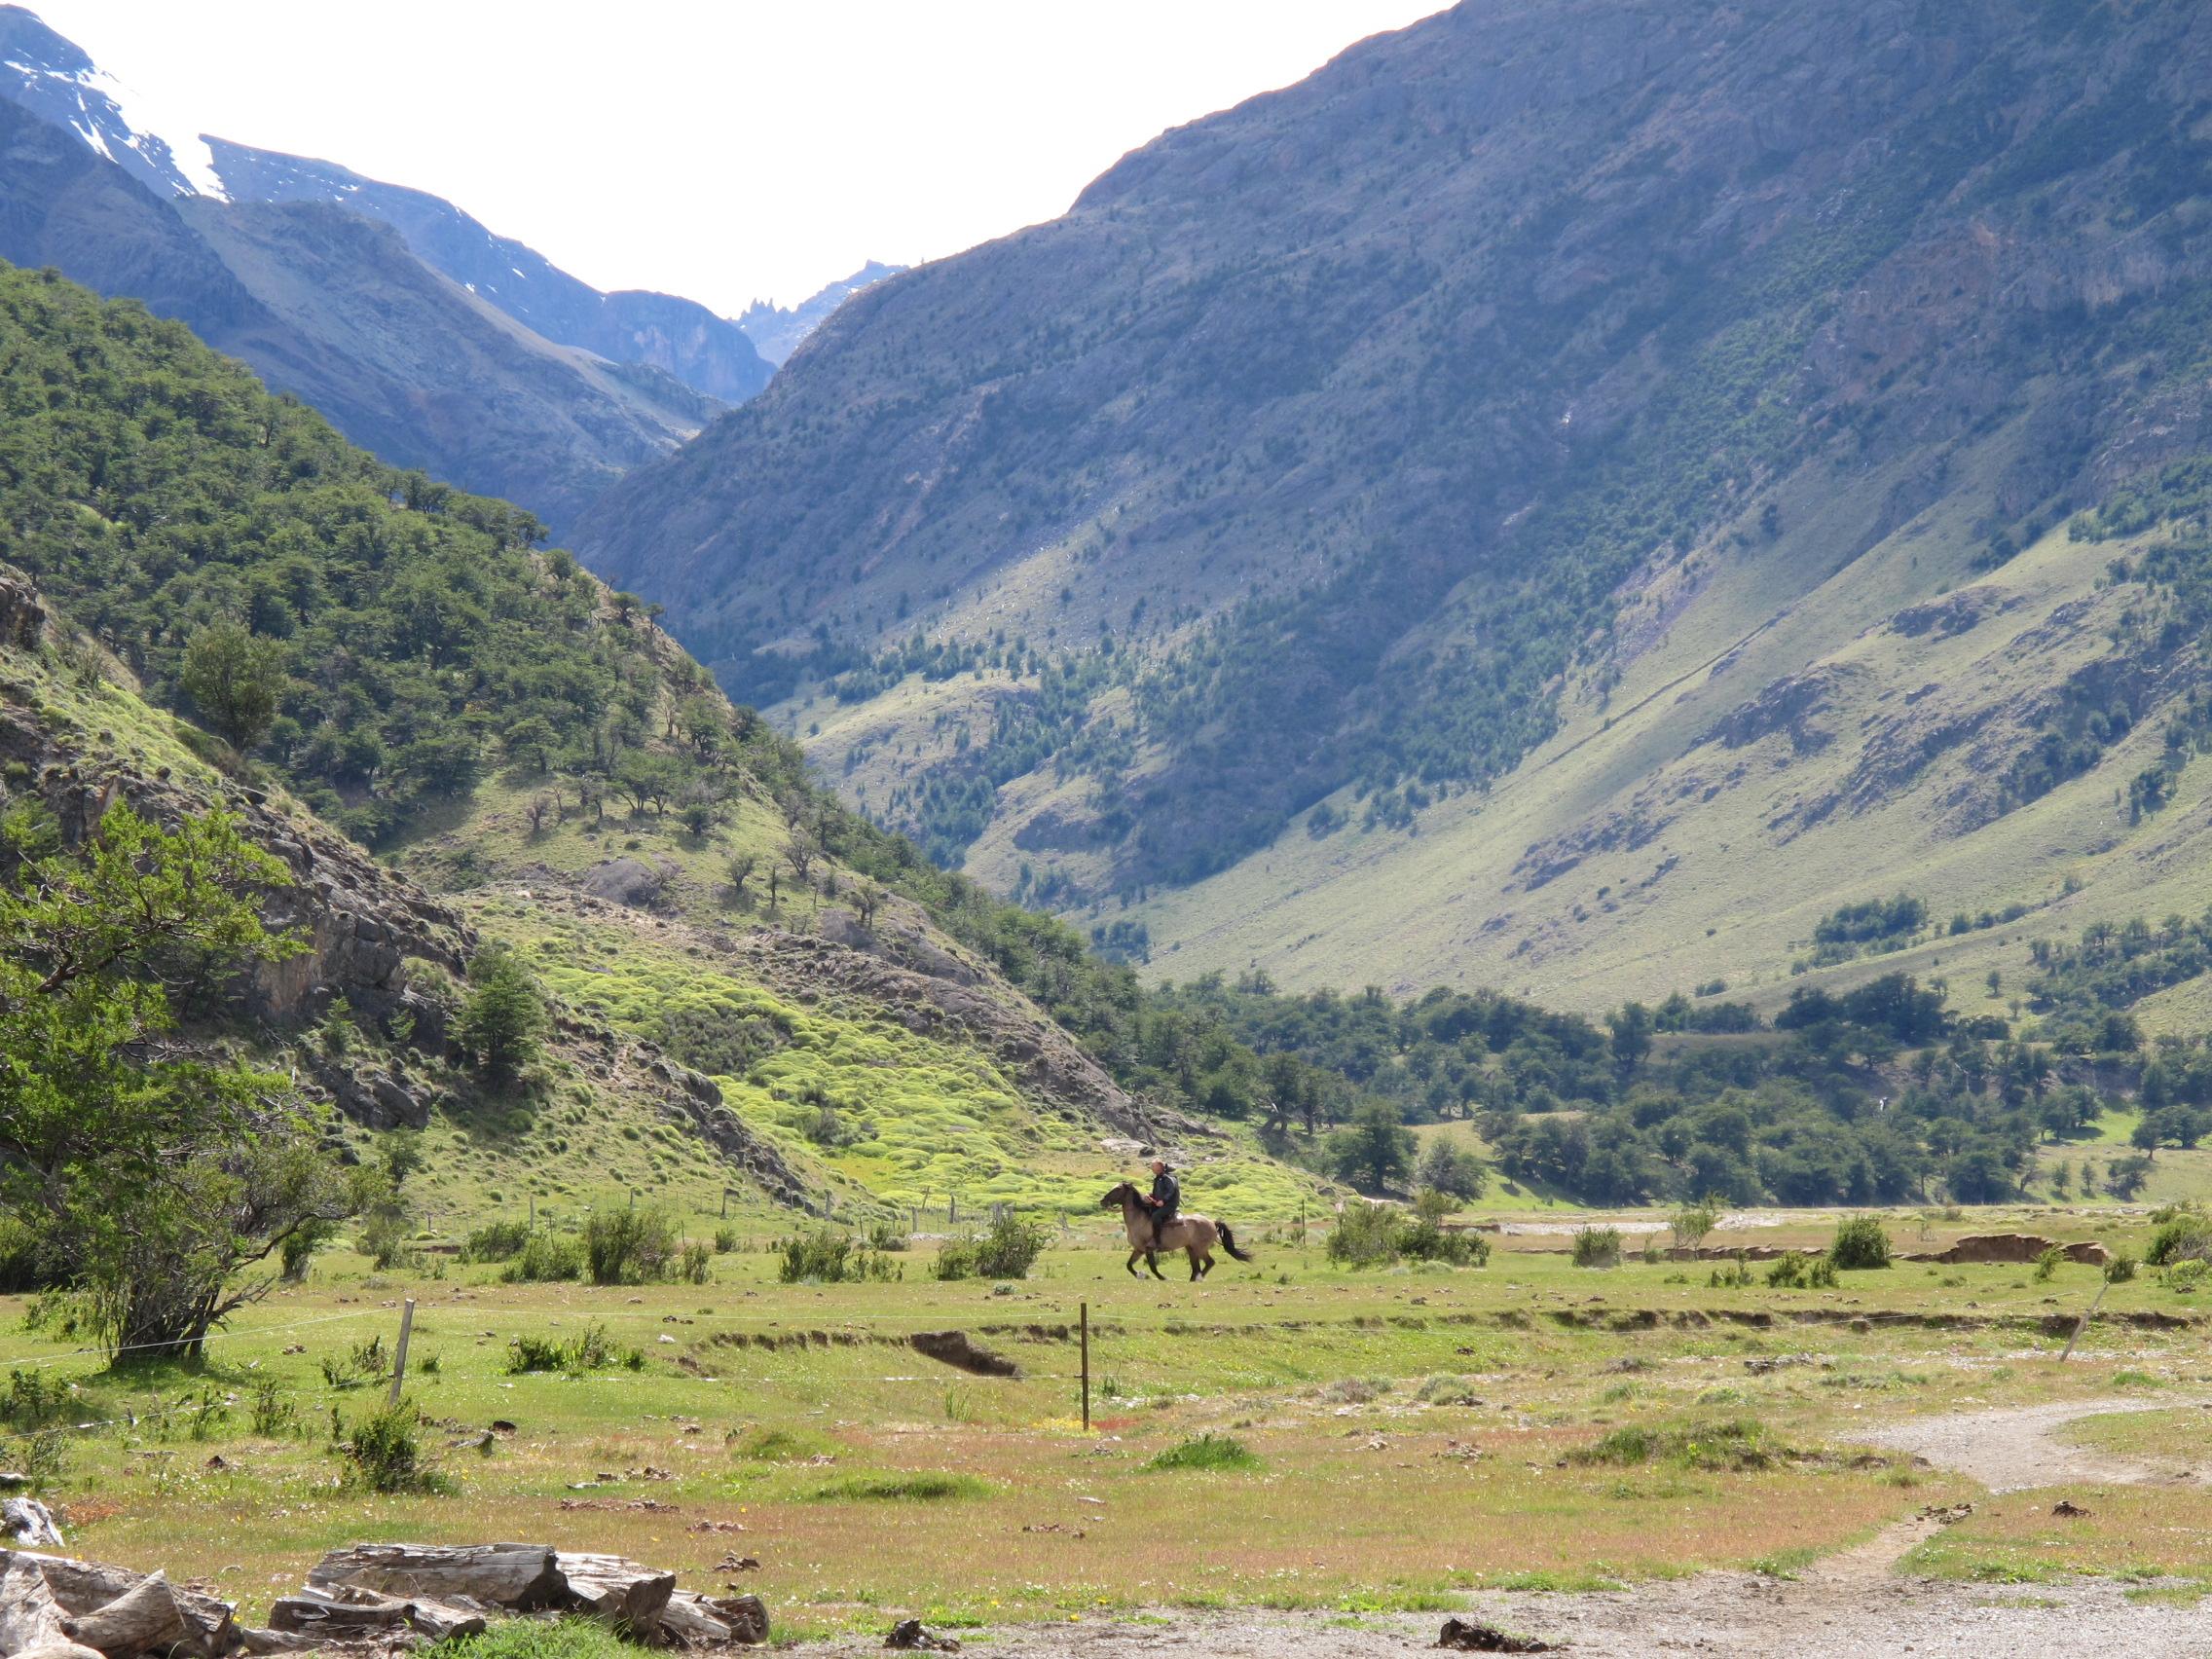 Greg riding below the hills